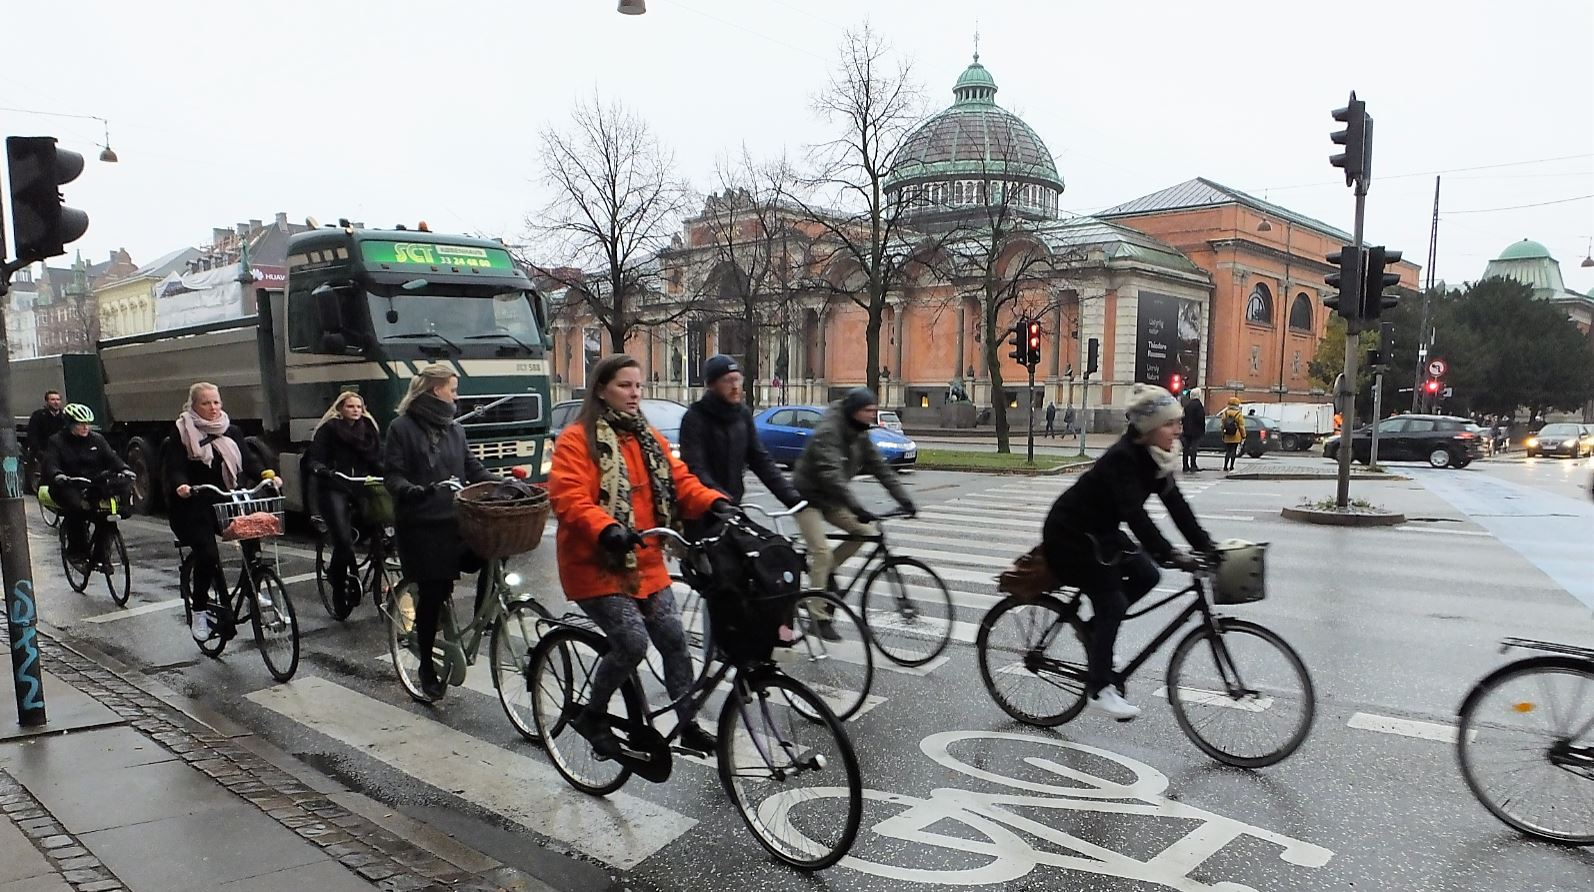 Denmark leads the way on statistics using microdata